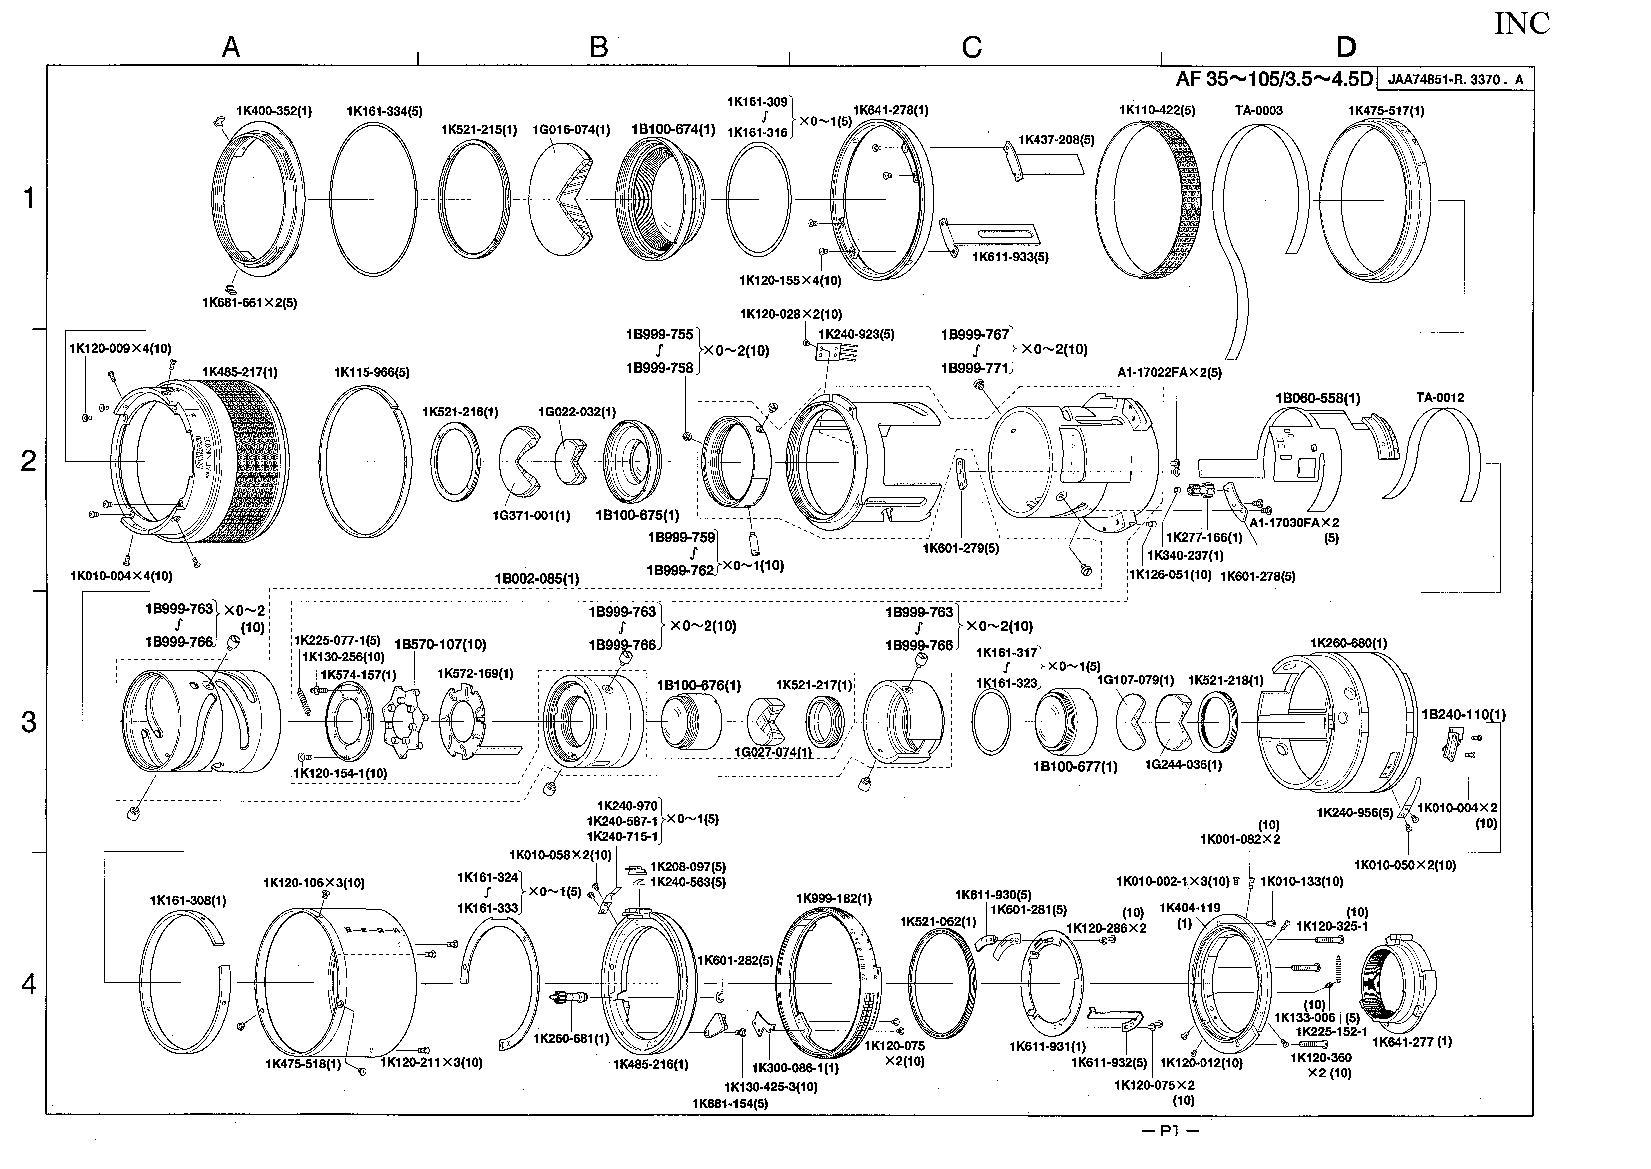 Pleasing Nikon Resurrection Repairing A Broken Lens Hackaday Wiring Digital Resources Funapmognl